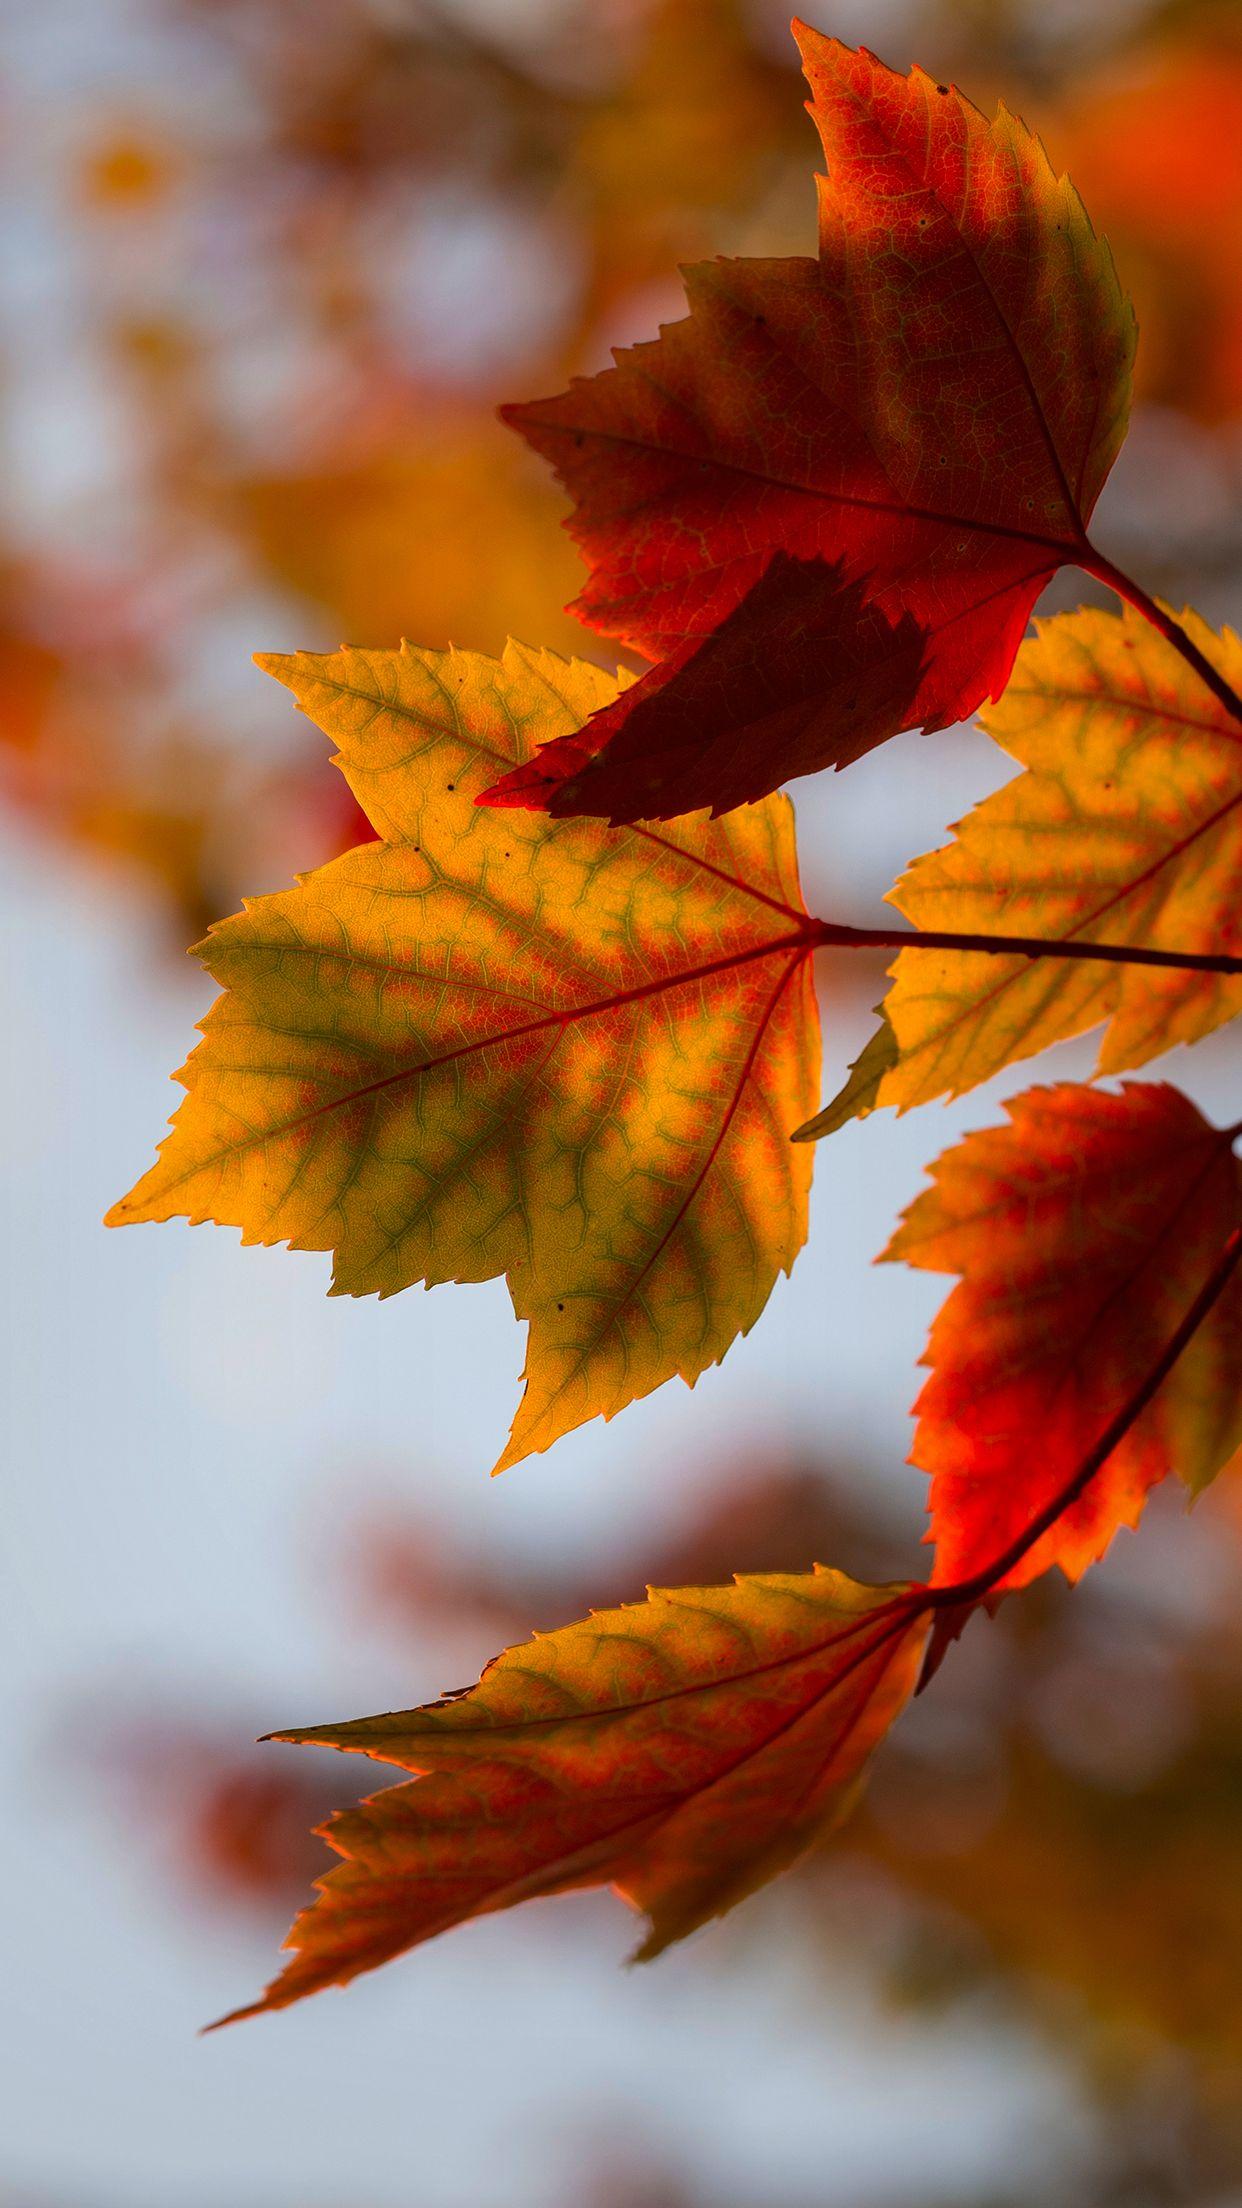 Amazing Hd Autumn Wallpaper Fall Wallpaper Iphone Wallpaper Fall Fall Pictures